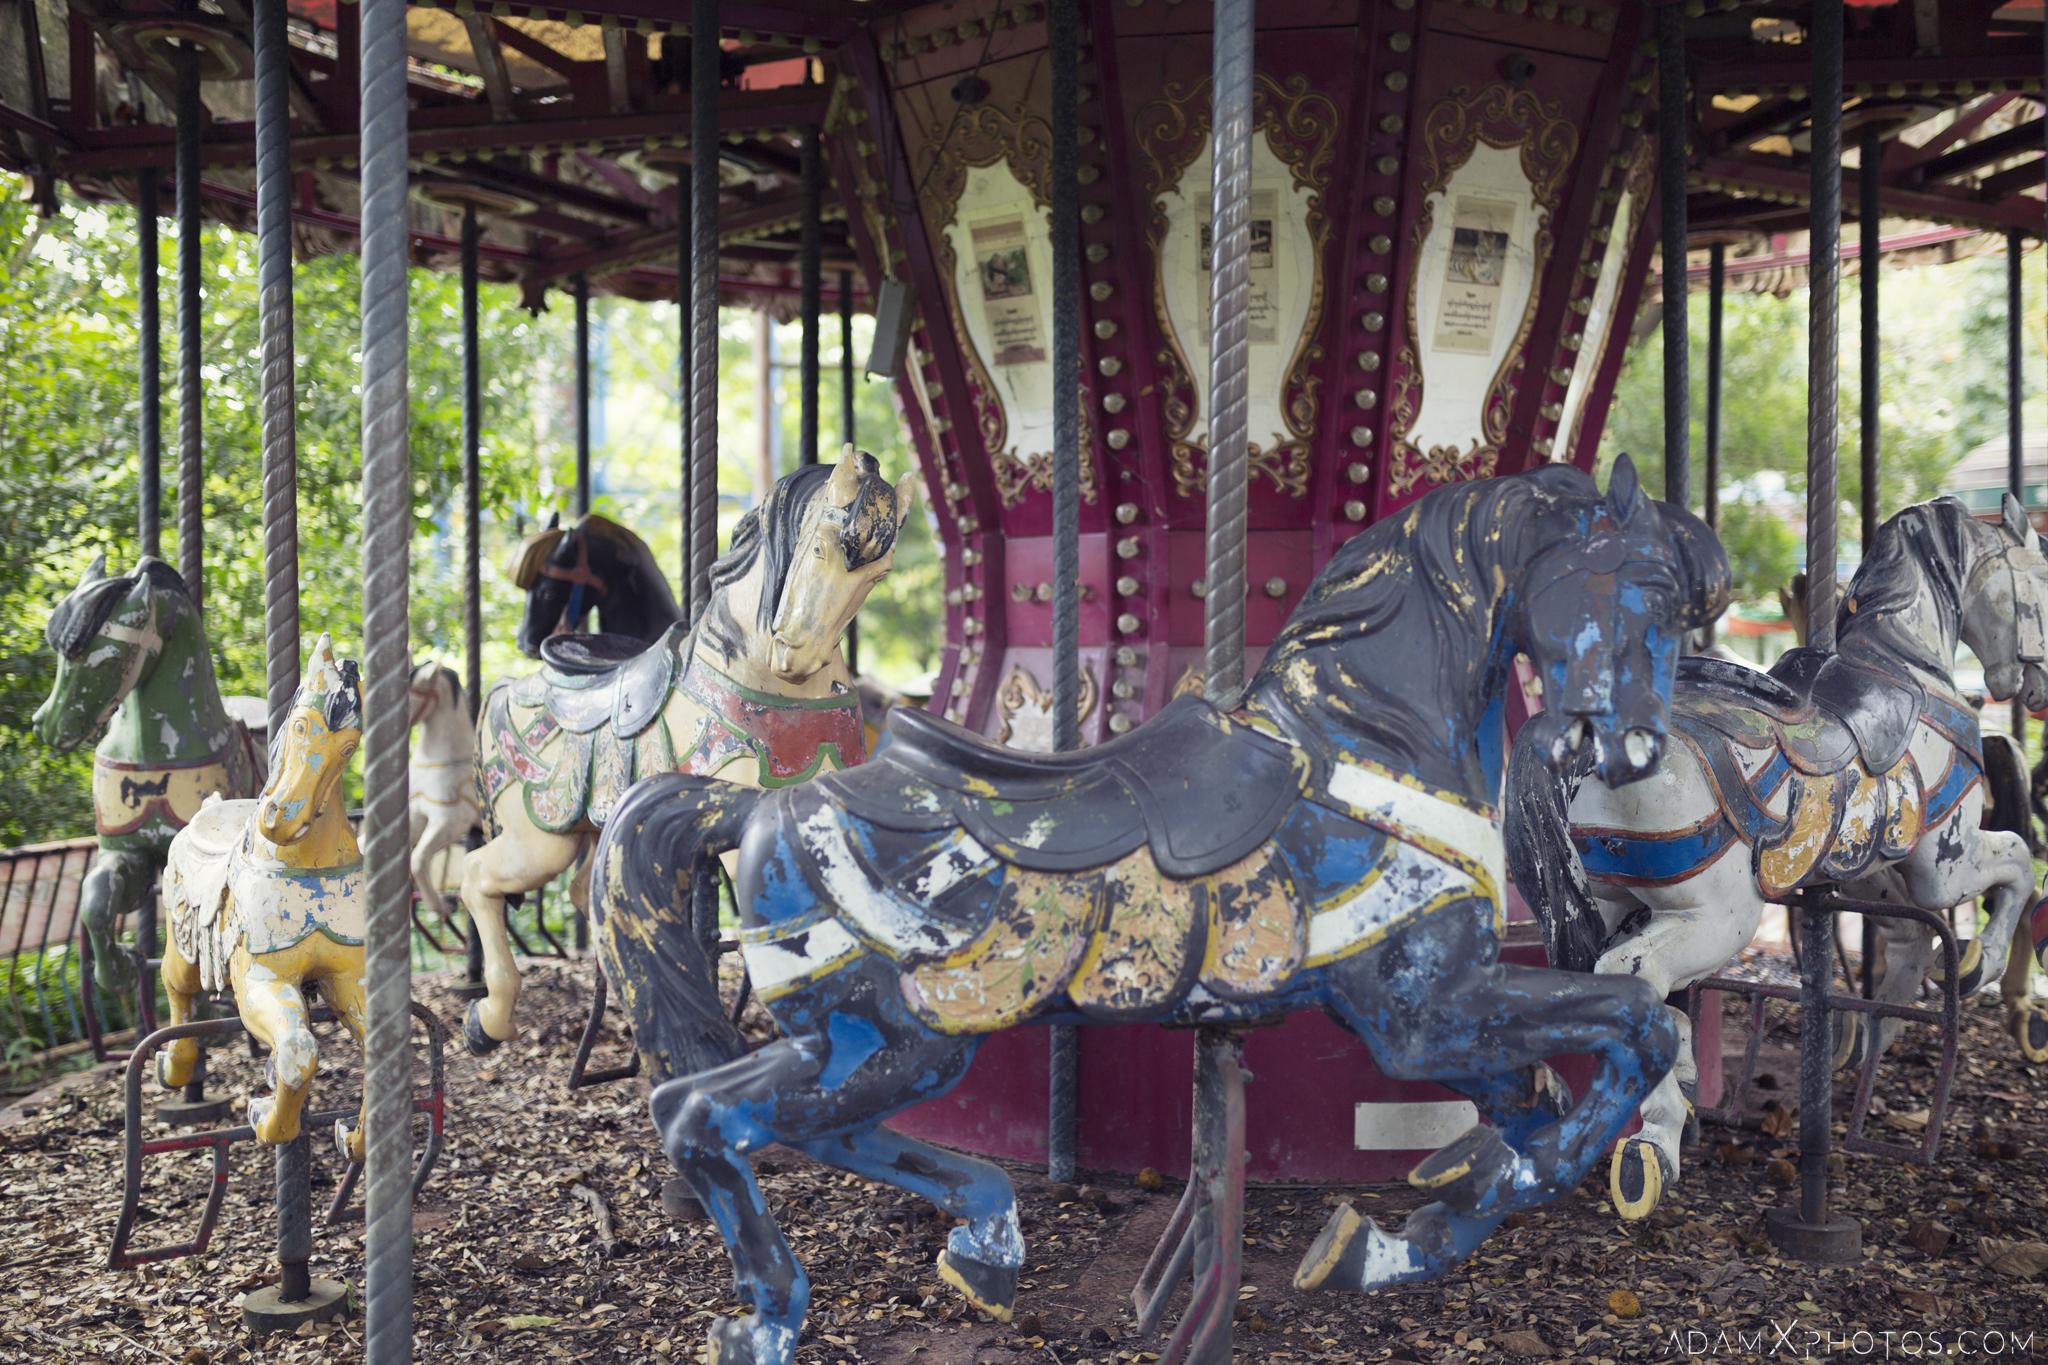 Horses carousel ride Happy World Theme Park Amusement Park Fairground Myanmar Burma Yangon Rangoon Urbex Adam X Urban Exploration Access 2016 Abandoned decay lost forgotten derelict location creepy haunting eerie